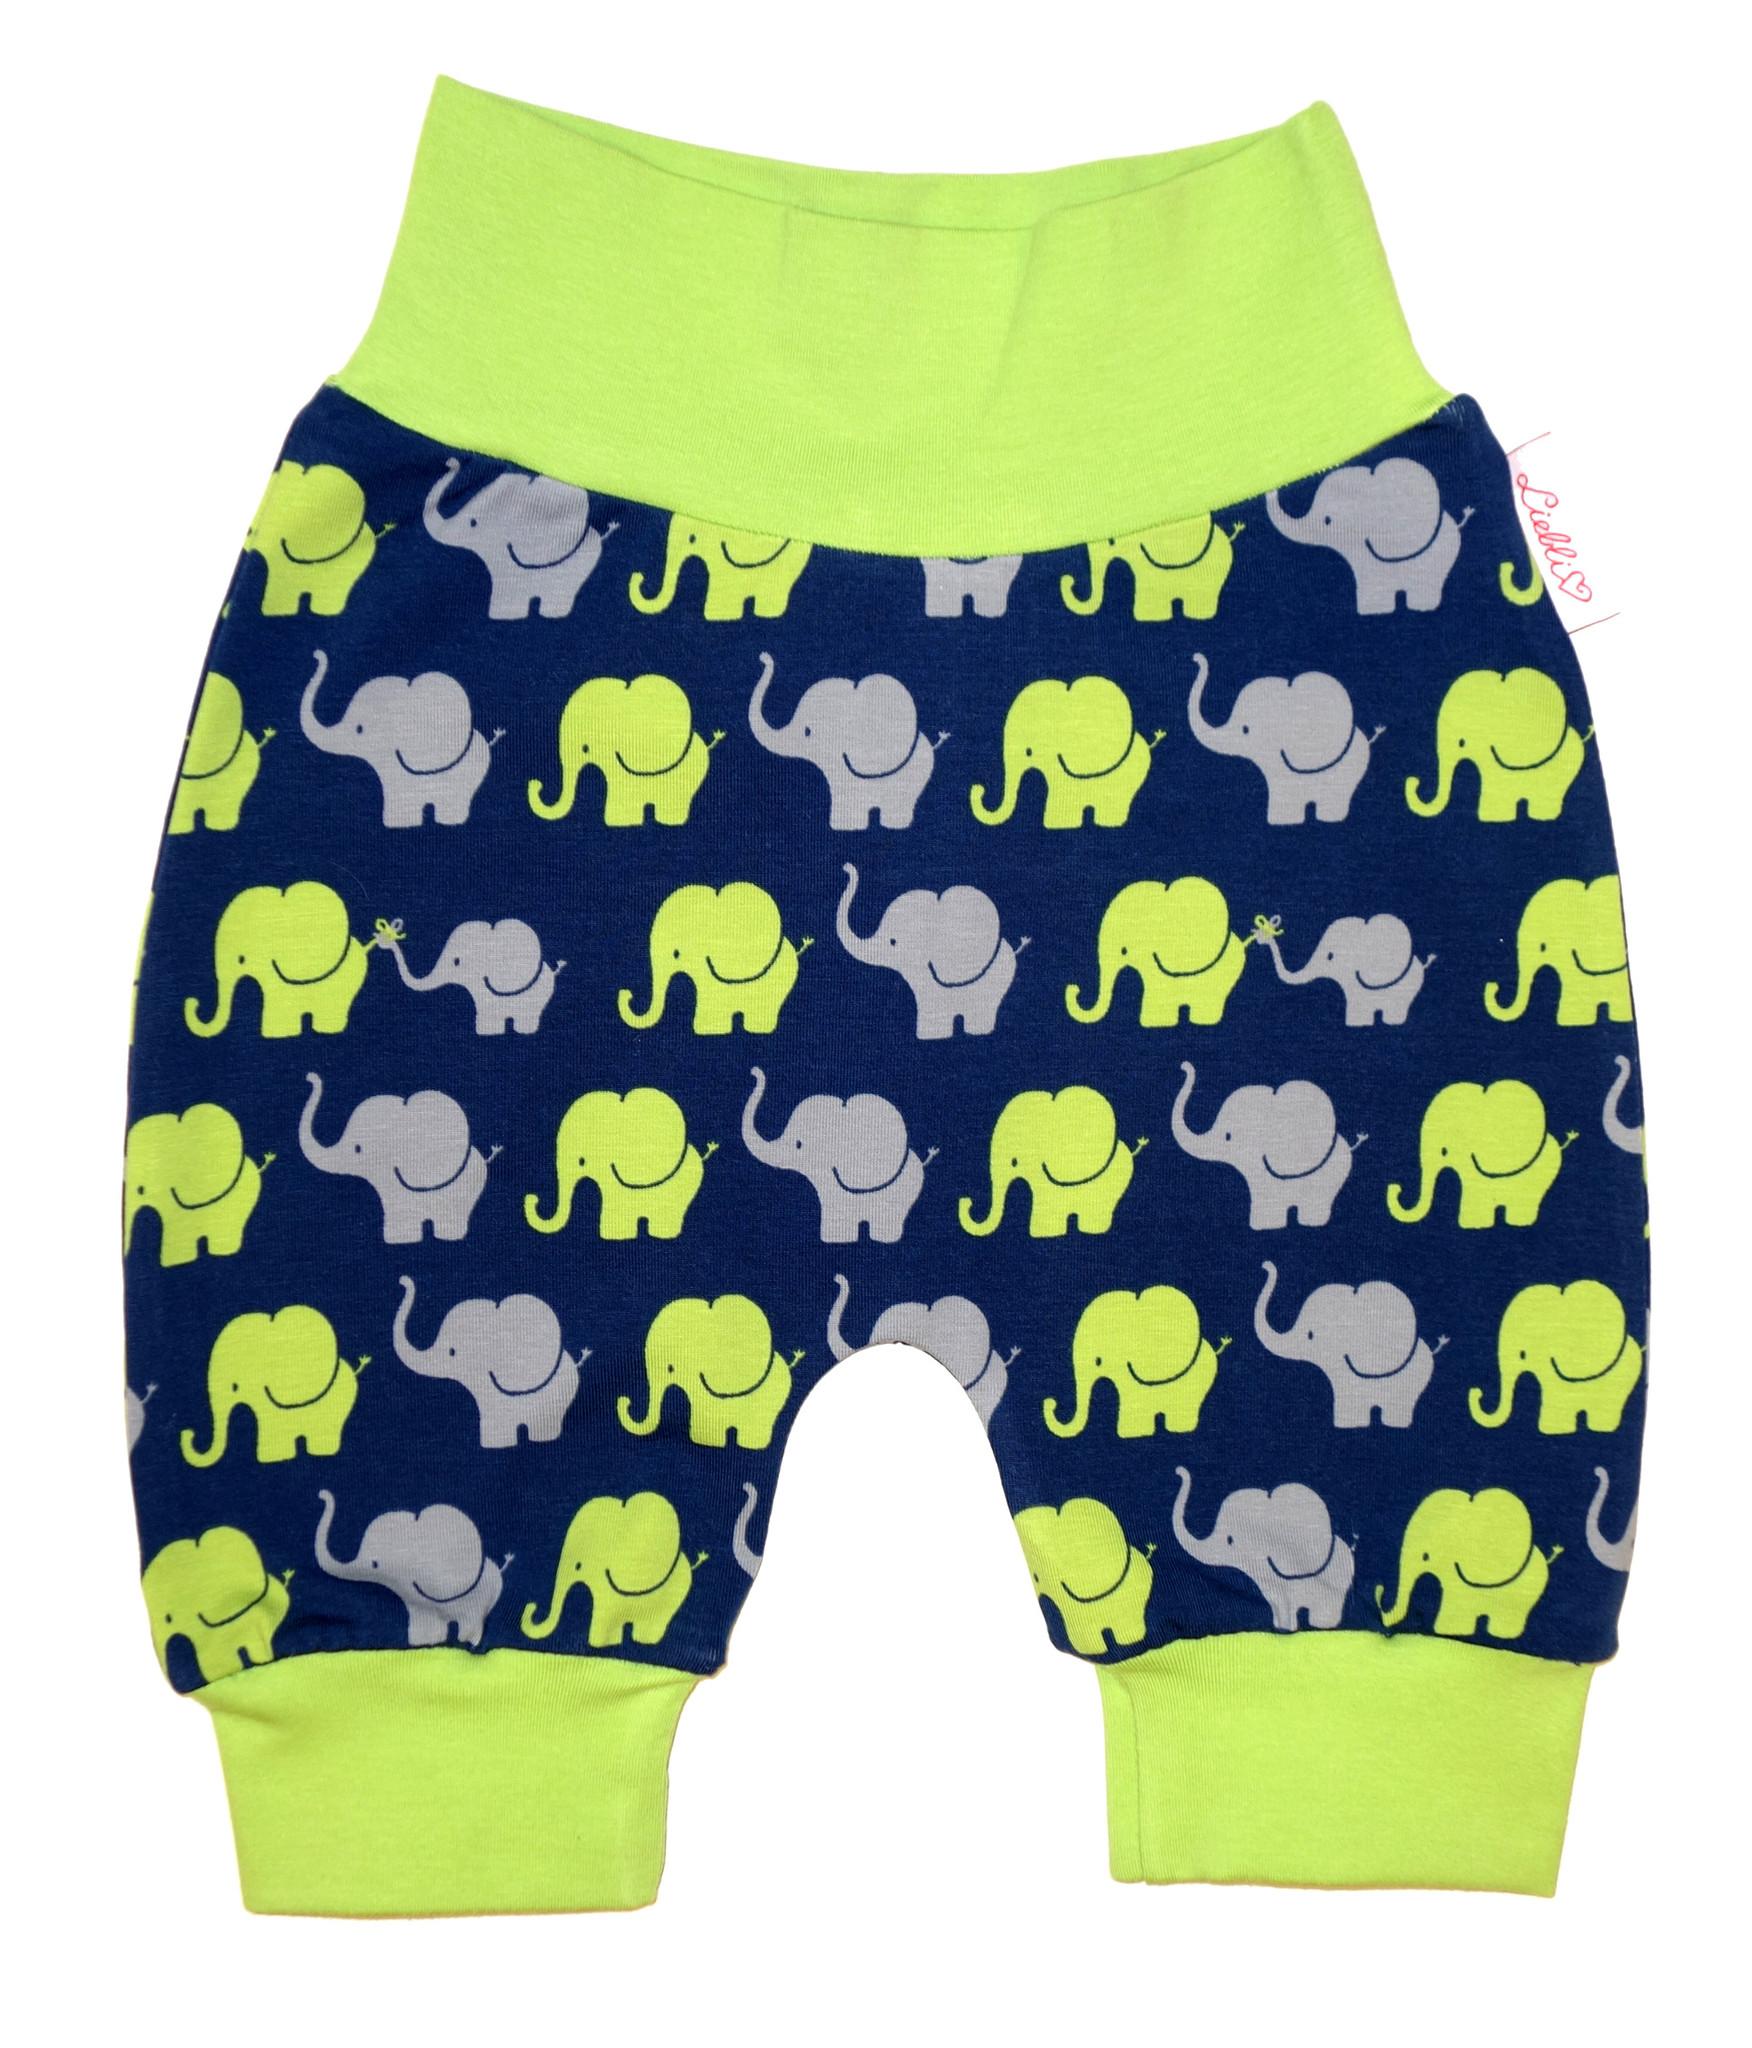 Babyhose / Pumphose, Elefanten dunkelblau grün grau